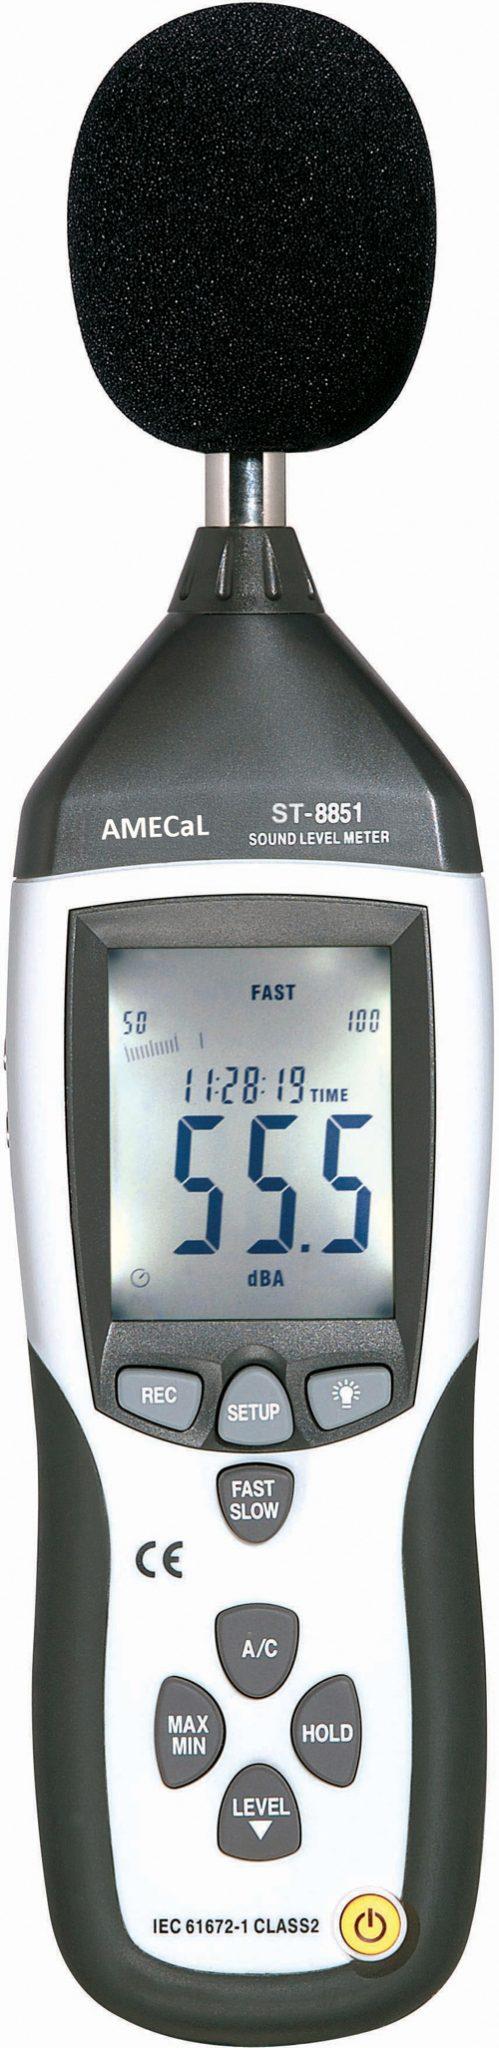 St 8851 Sound Level Meter Amecal Aml Instruments Pressure